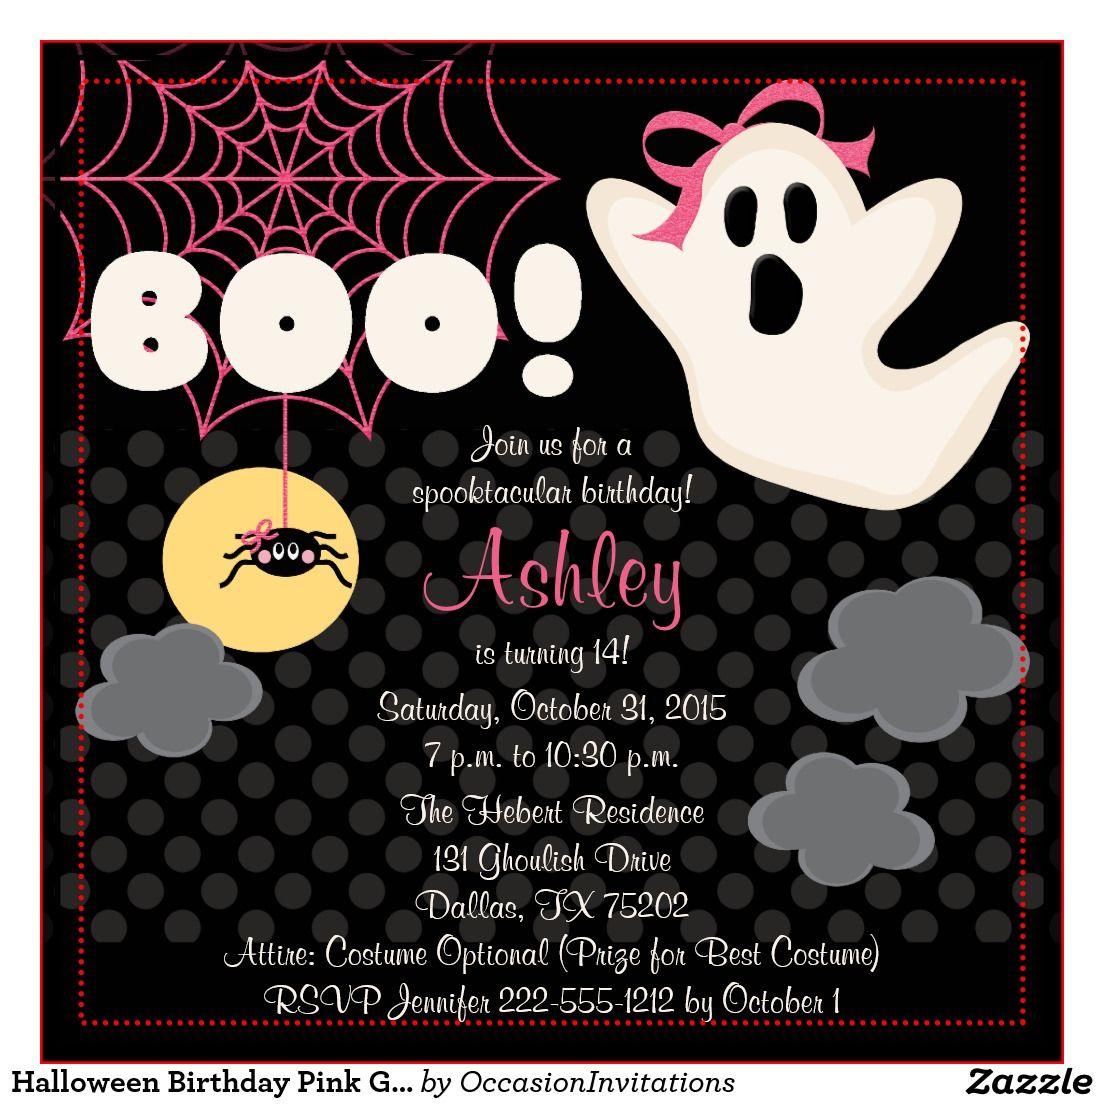 Kid-Friendly Halloween Birthday Invitations, non-scary halloween ...